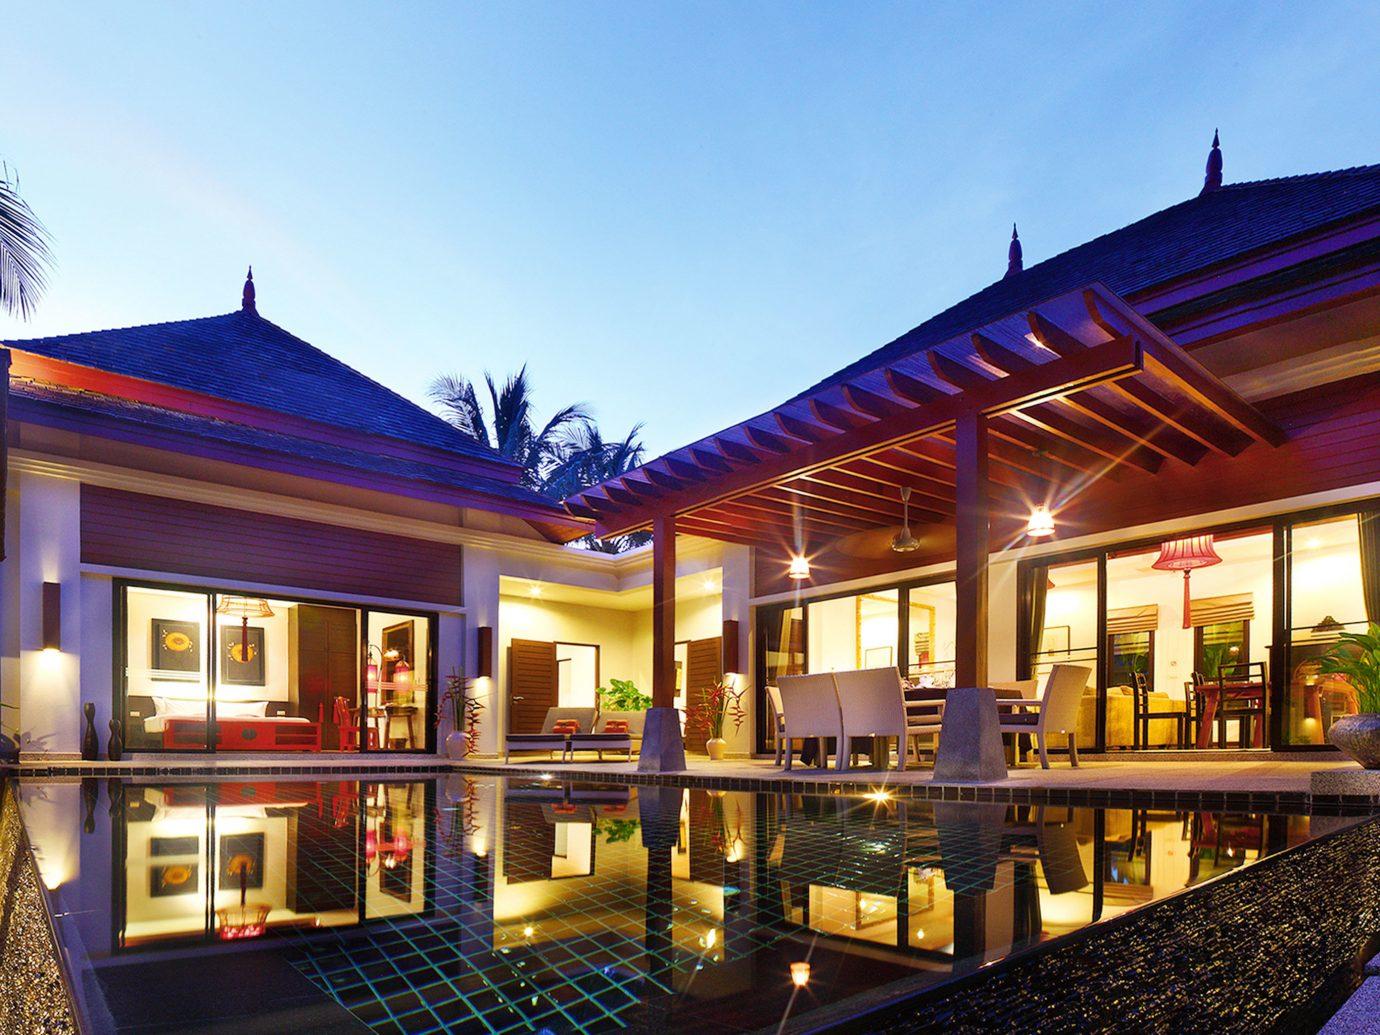 Elegant Hotels Jungle Patio Pool Tropical building sky outdoor property Resort estate house home real estate mansion condominium interior design facade restaurant Villa